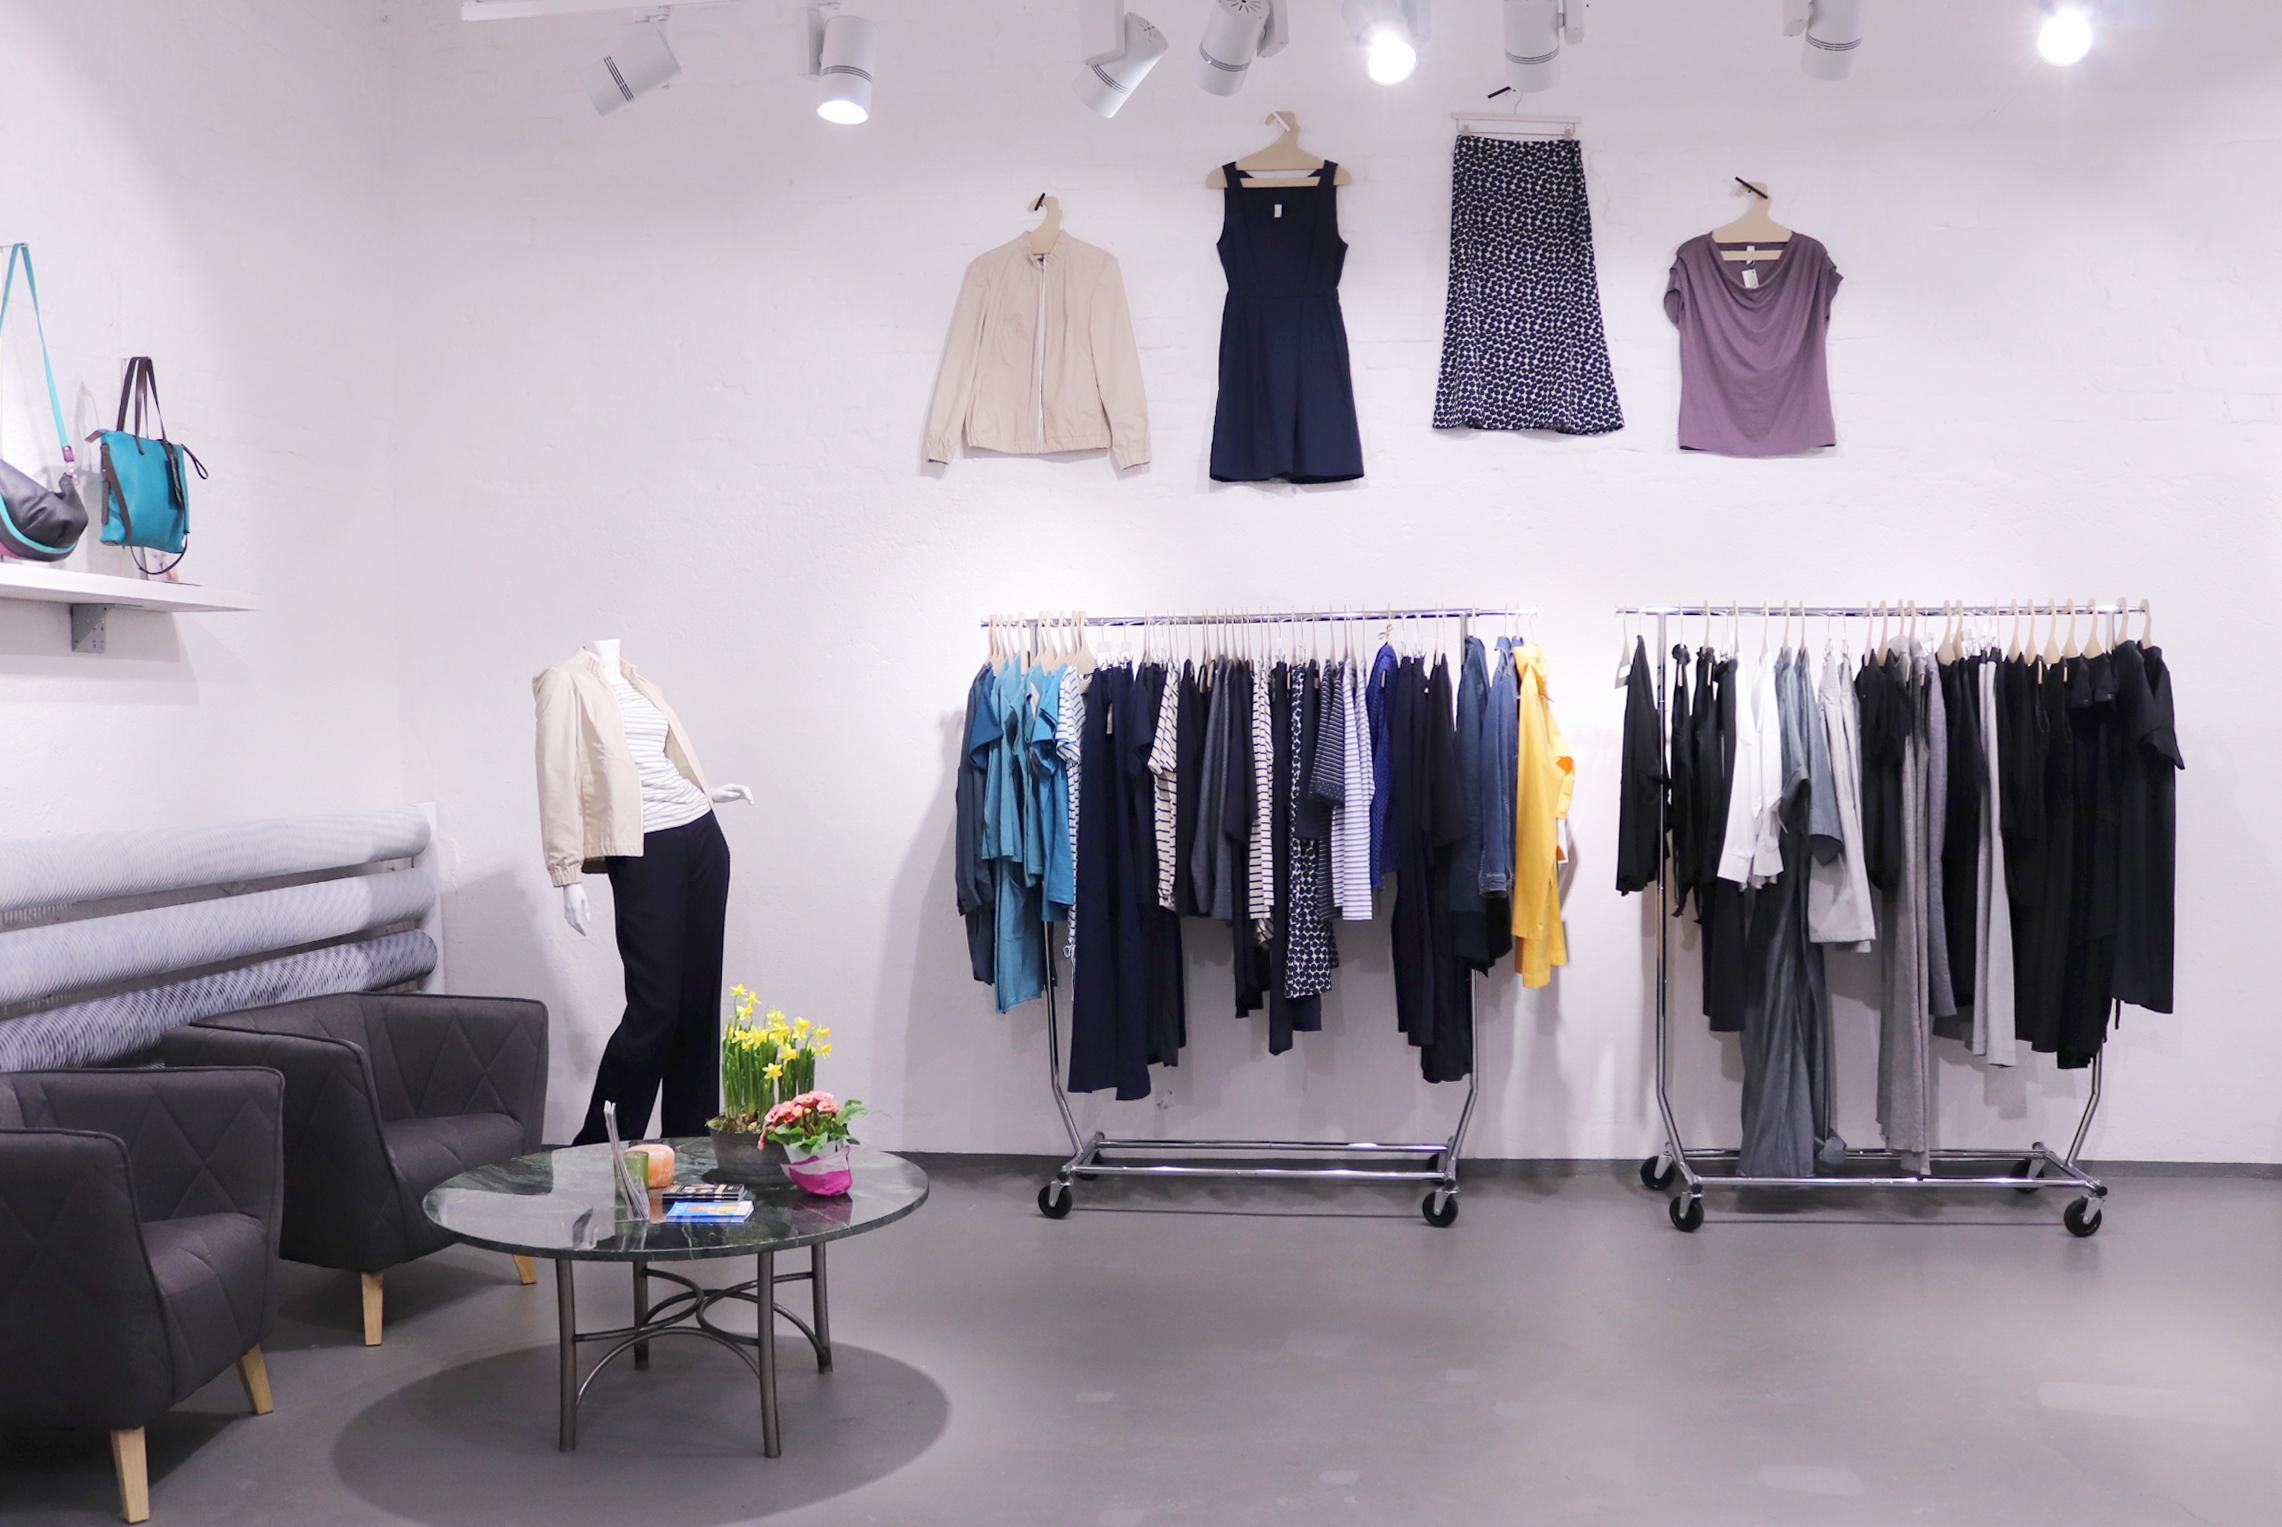 https://www.buygoodstuff.de/wp-content/uploads/2019/01/Bild-4-roberta_organic_fashion_Seite.jpg